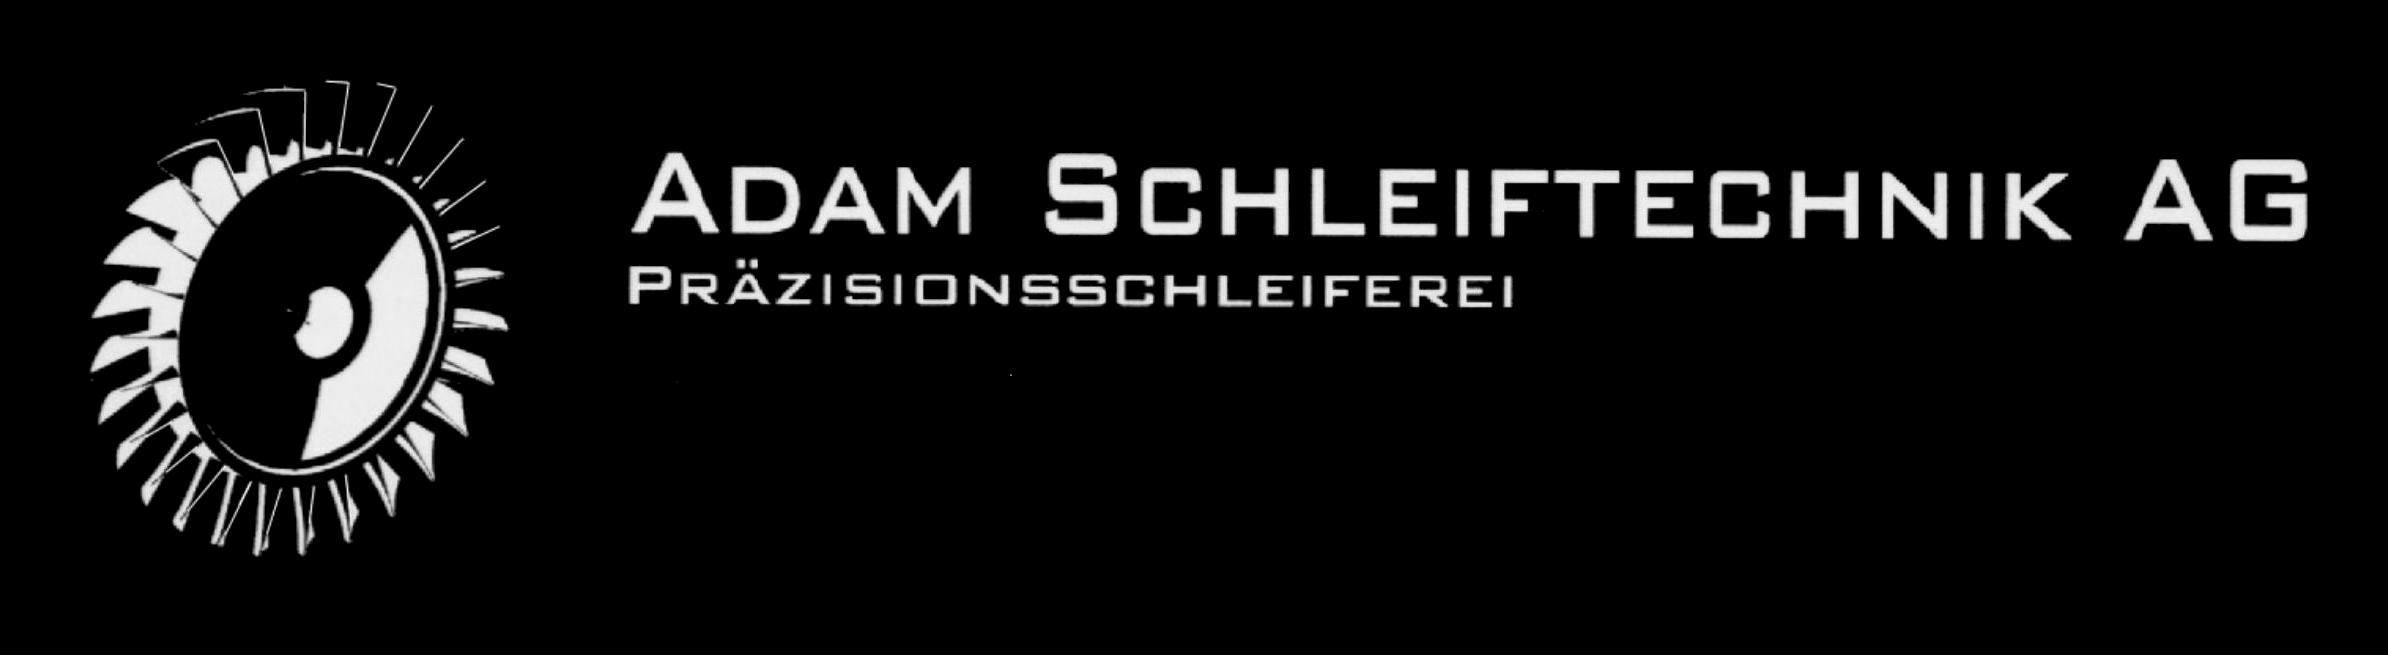 Adam Schleiftechnik AG